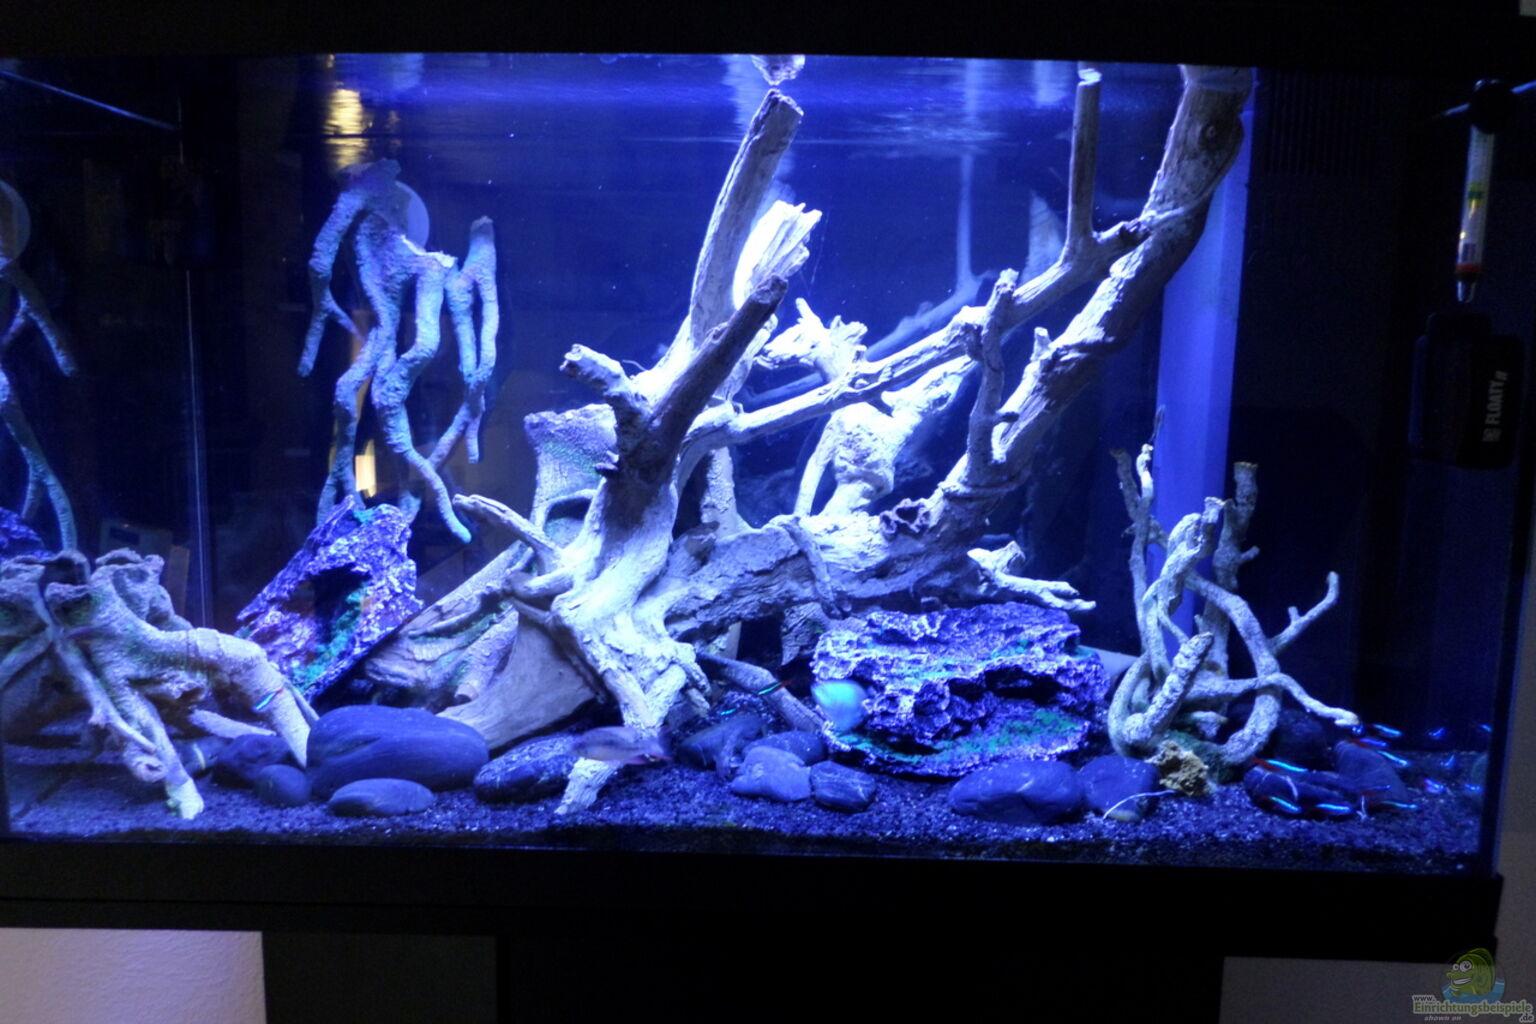 Aquarium von hans hubert becken 32838 for Aquarium becken